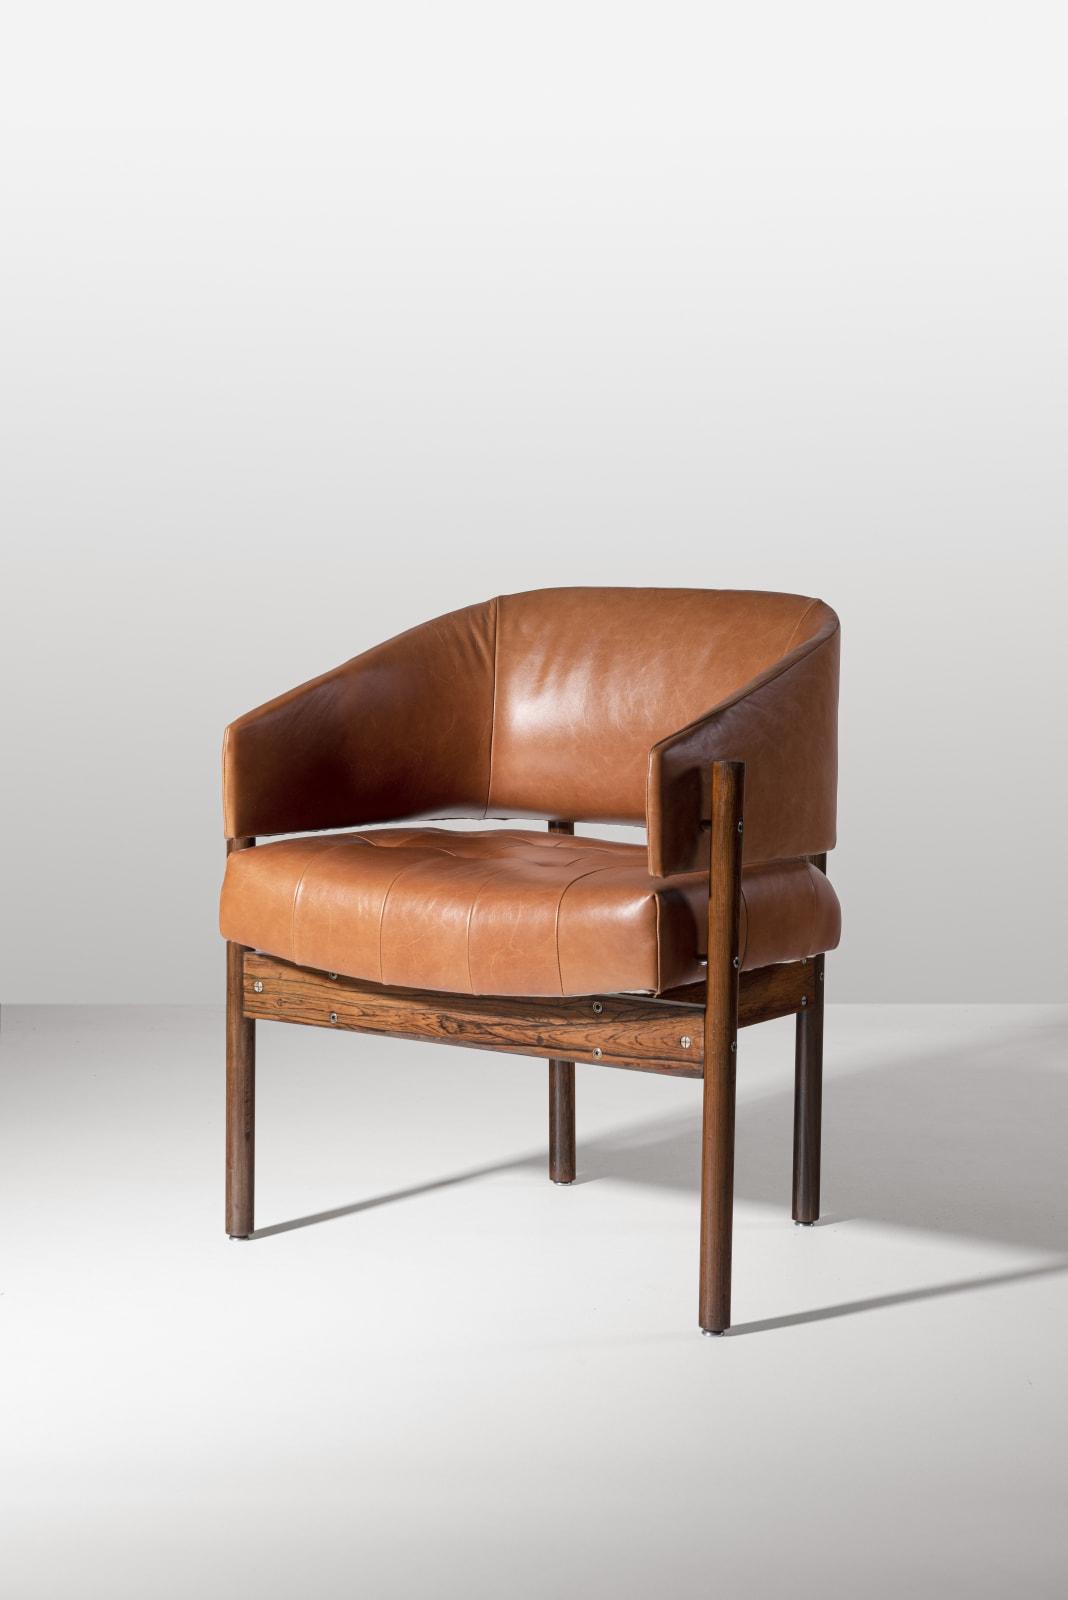 Jorge Zalszupin, Senior armchair, 1959